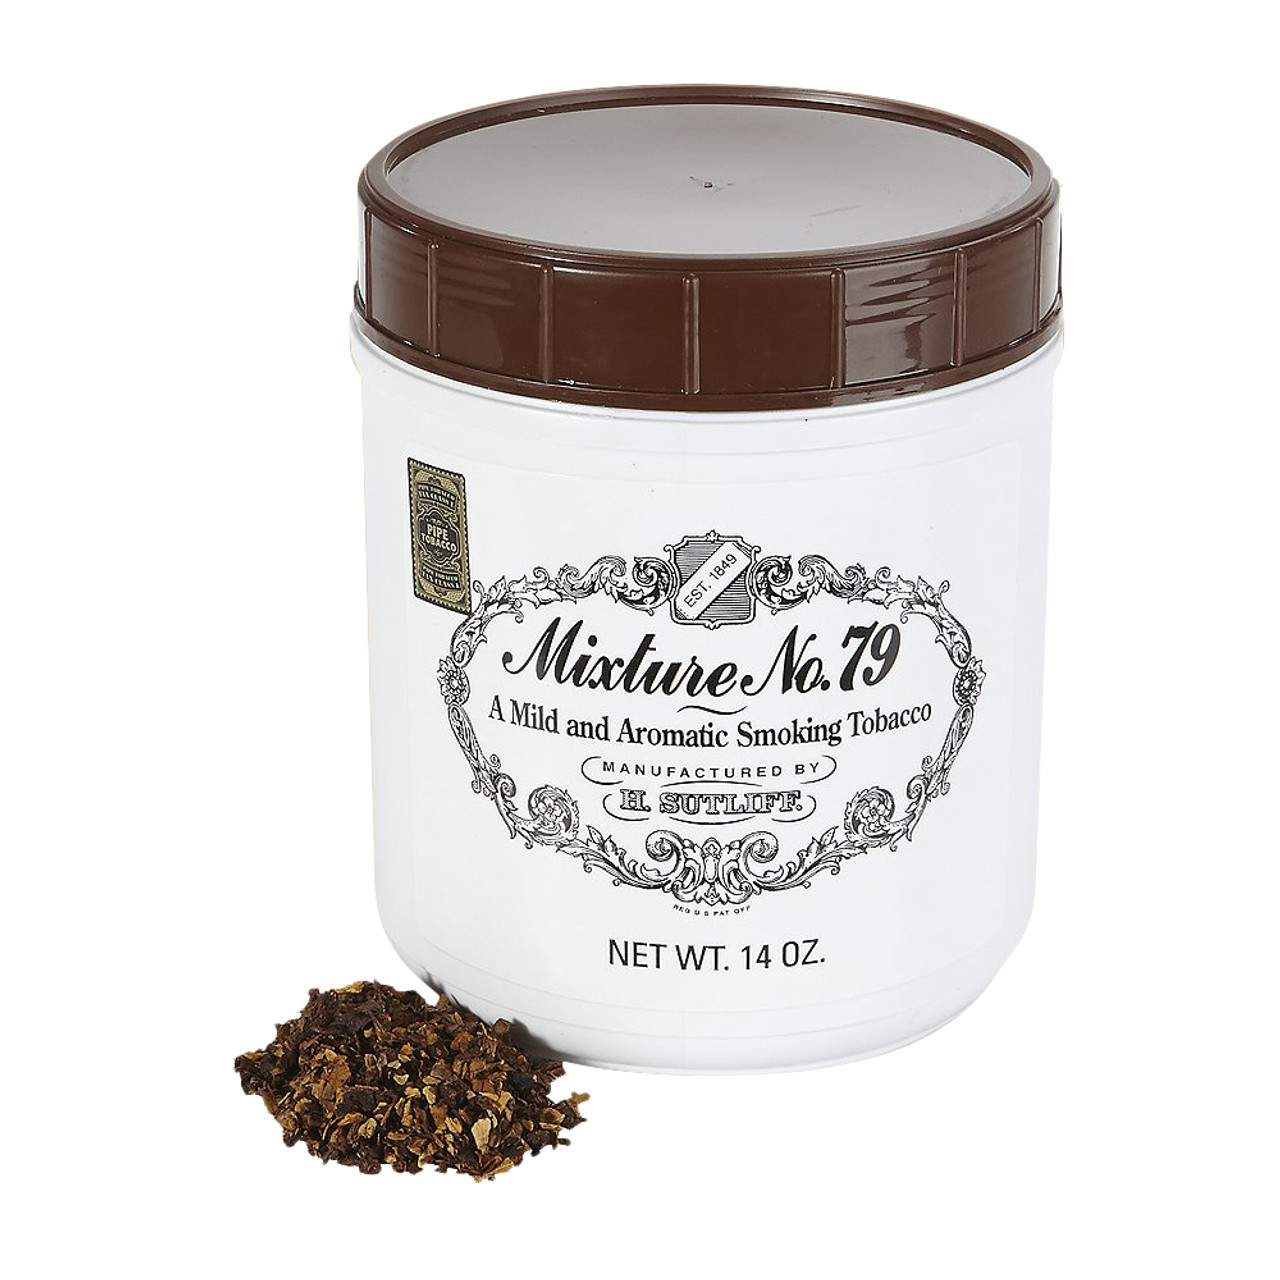 Mixture No. 79 Pipe Tobacco | 14 OZ TIN